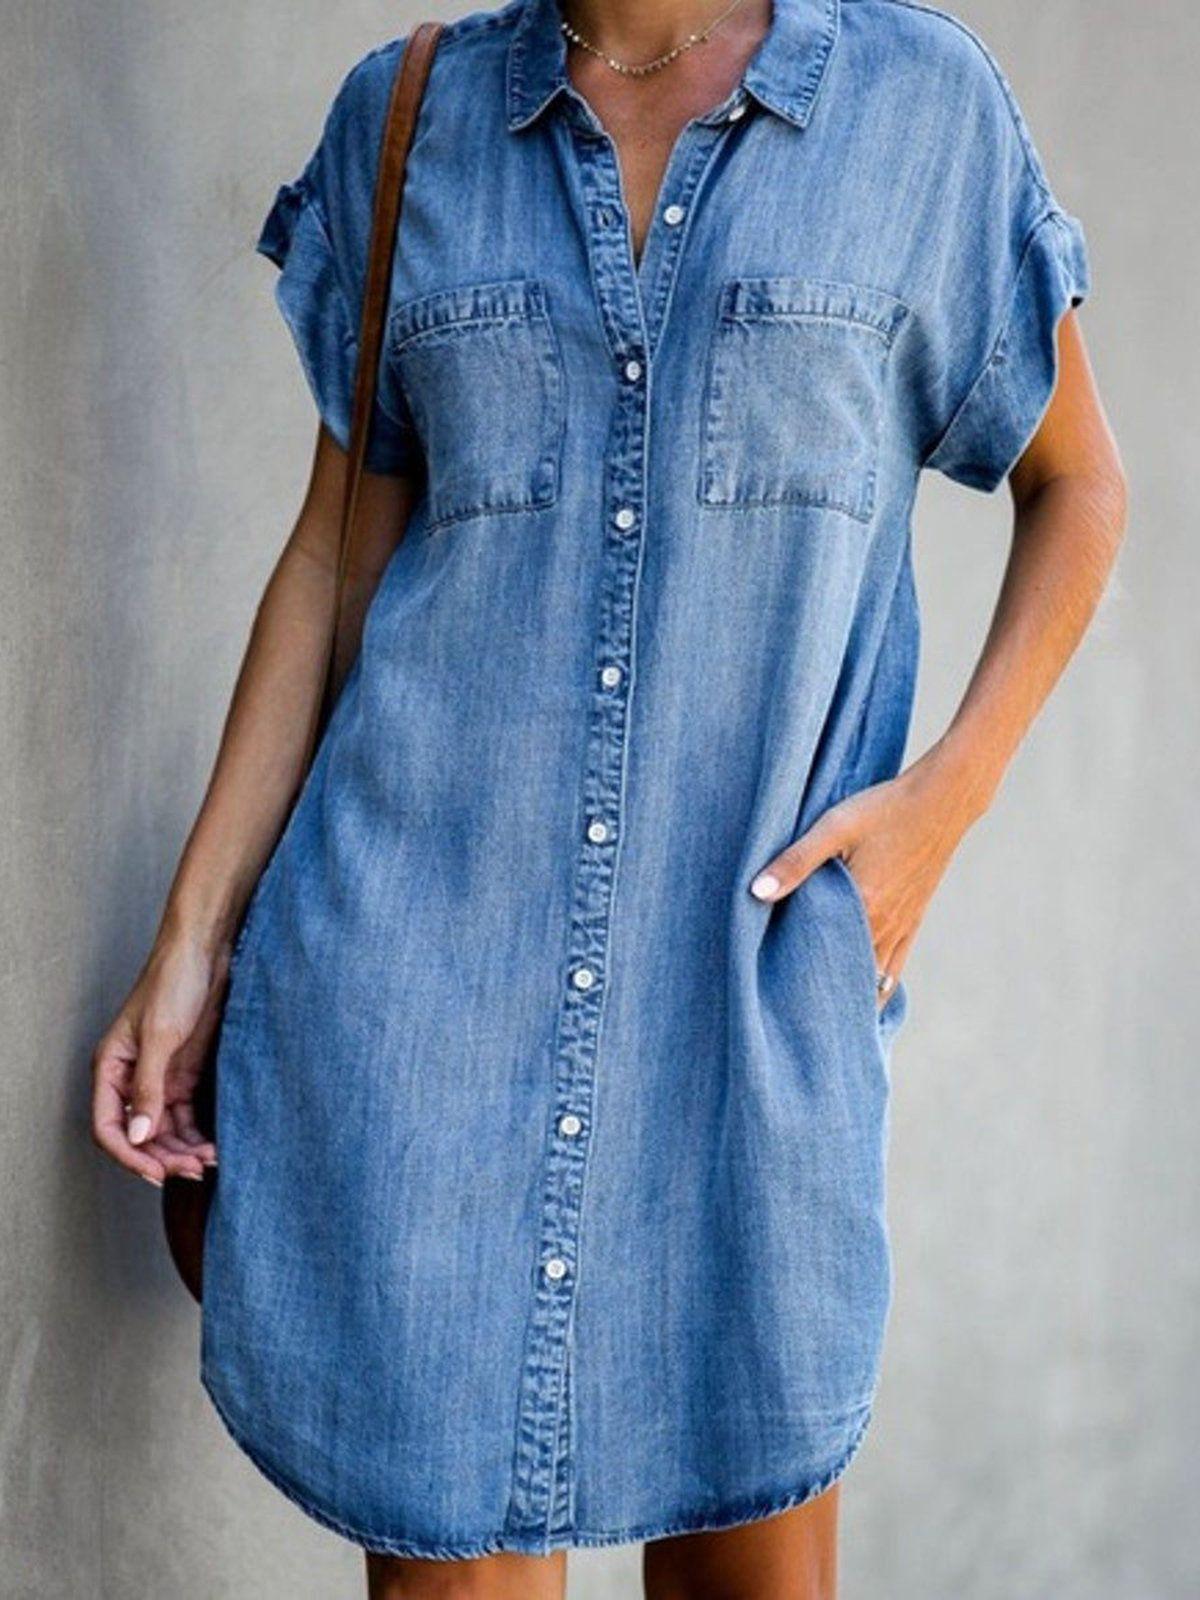 Blue Casual Denim Plain Shirt Collar Causal Dresses Noracora Short Sleeve Denim Dress Casual Summer Dresses Casual Short Sleeve Dress [ 1600 x 1200 Pixel ]